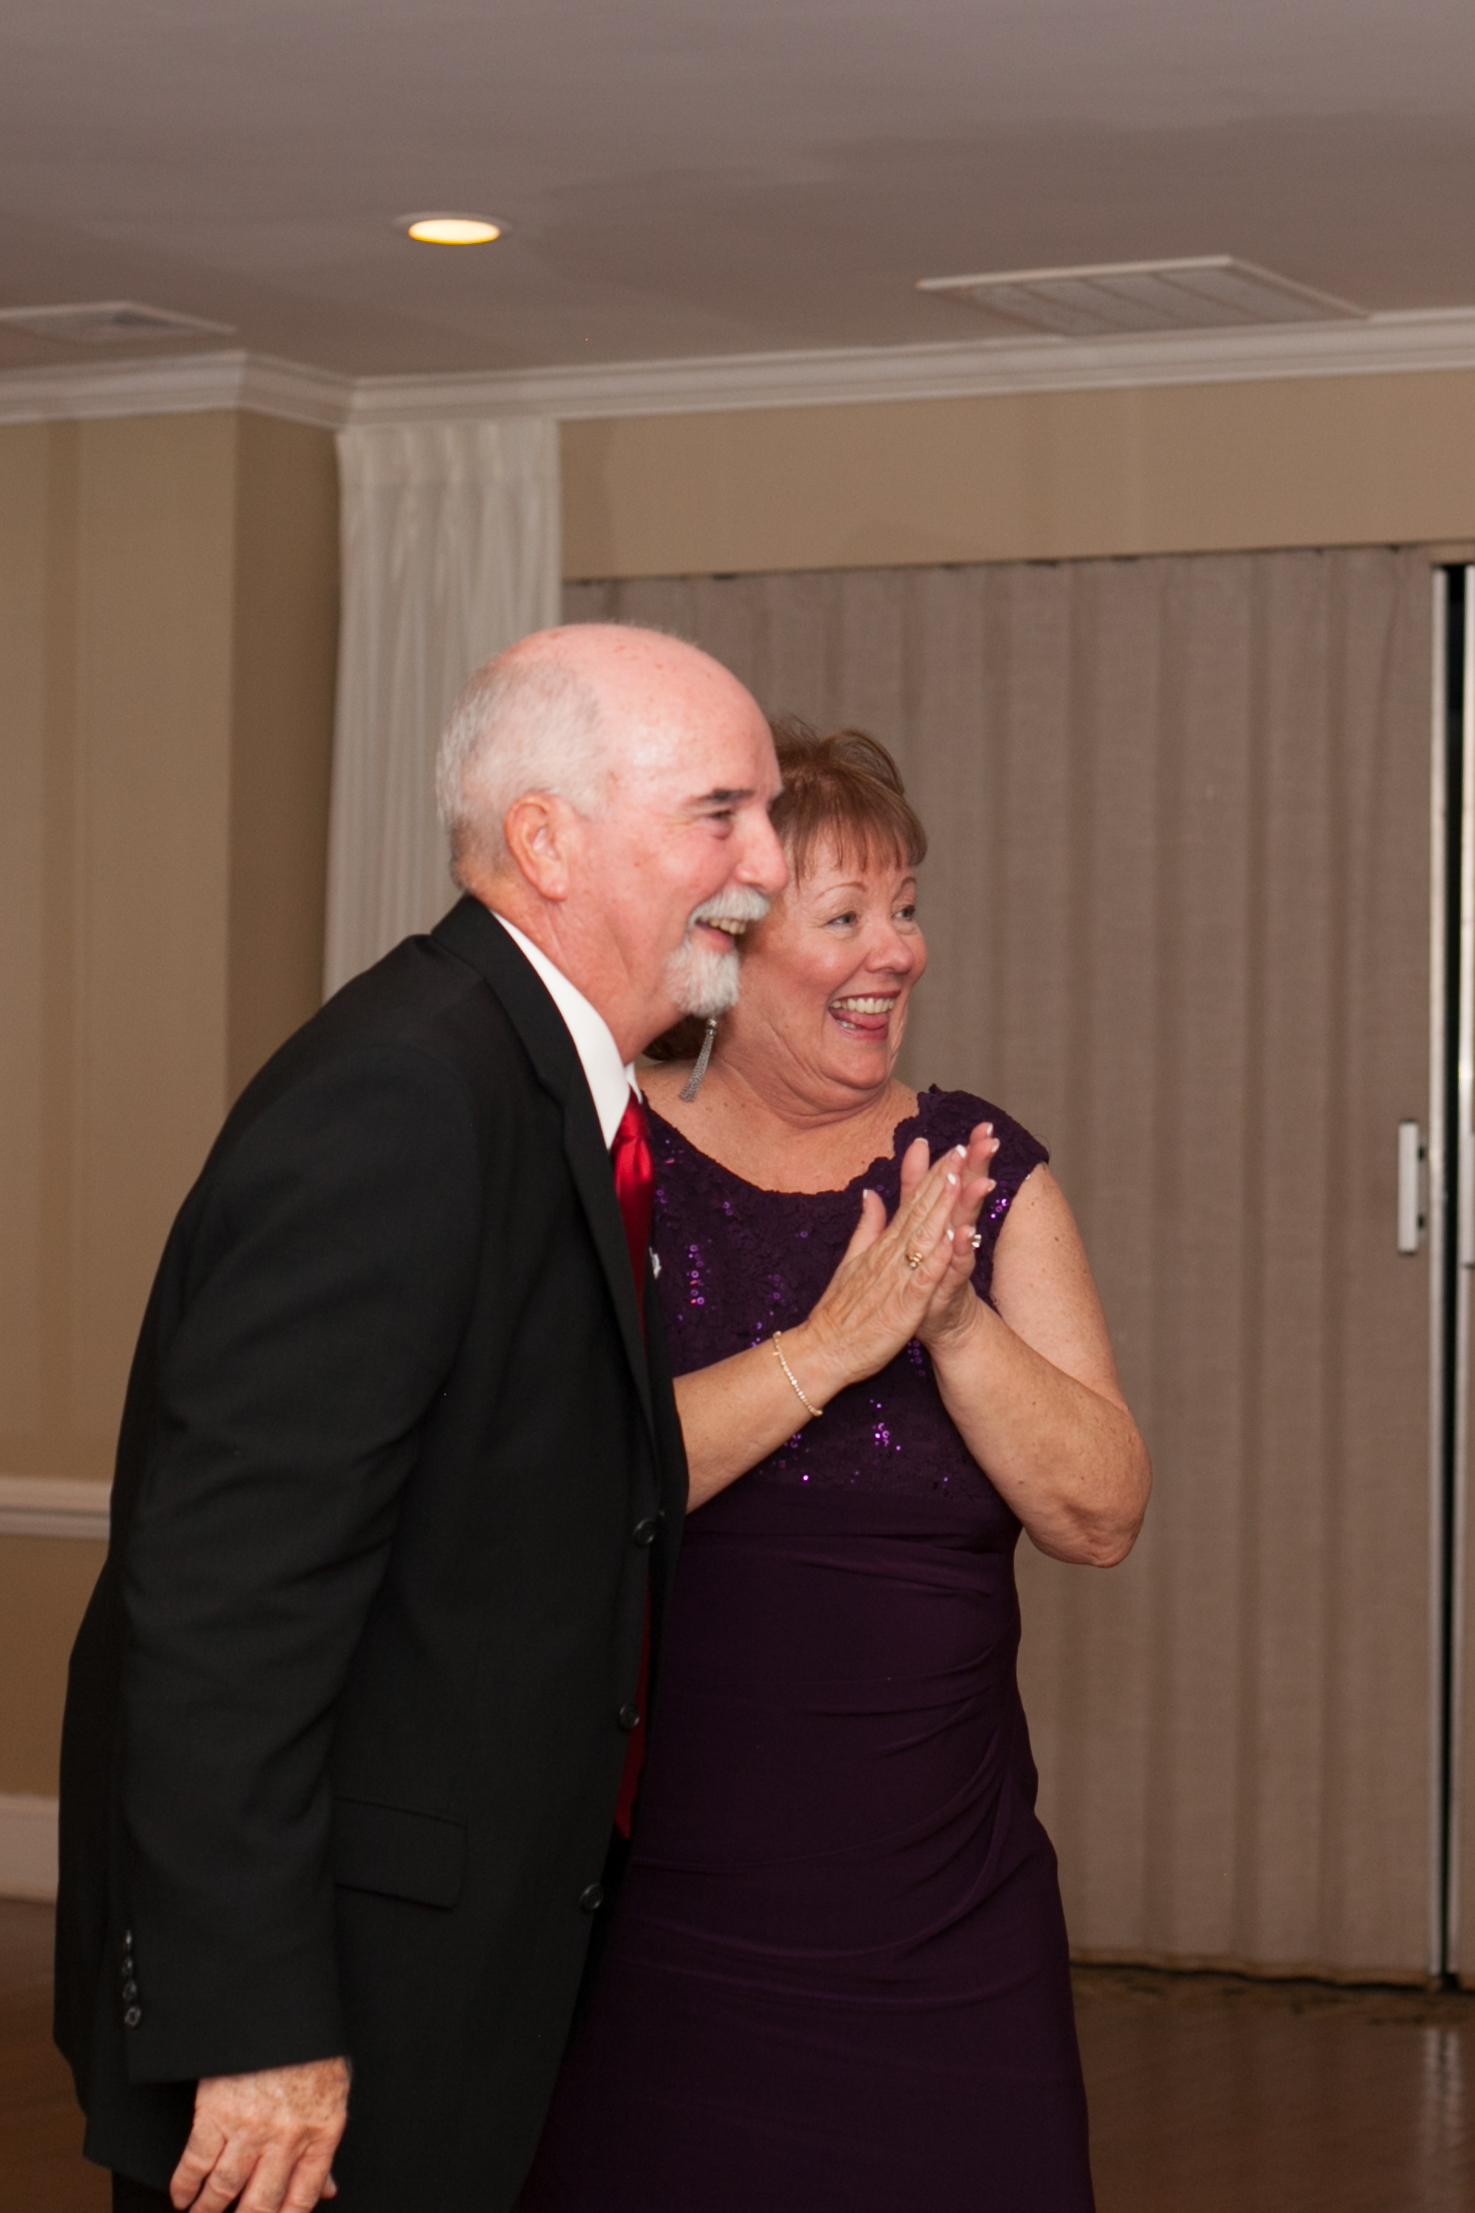 Alysha and Bobby - Reception (55 of 228).jpg